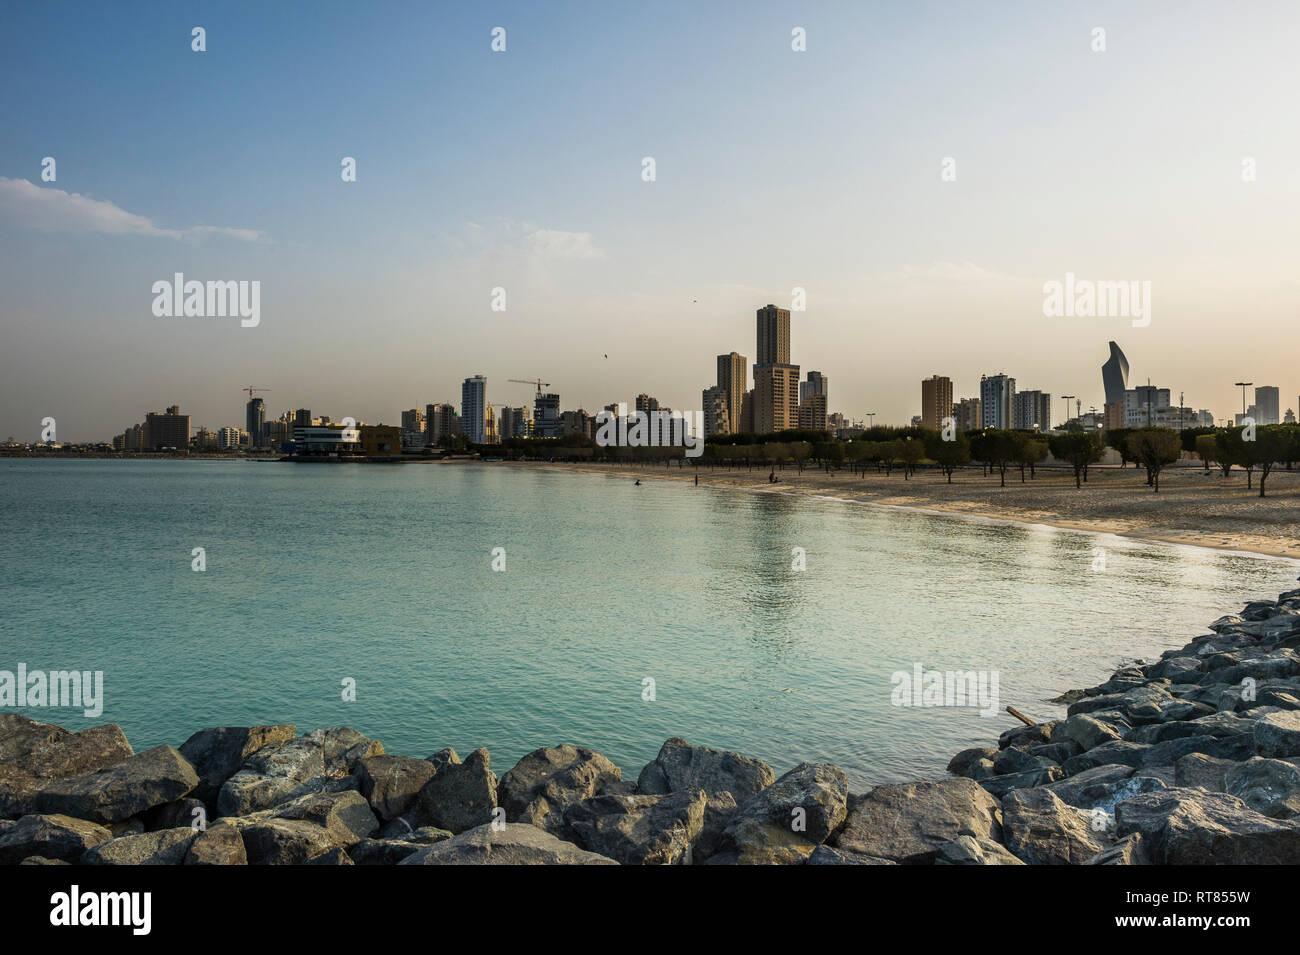 Arabia, Kuwait, Kuwait City, Persian Gulf, beach in the evening light - Stock Image